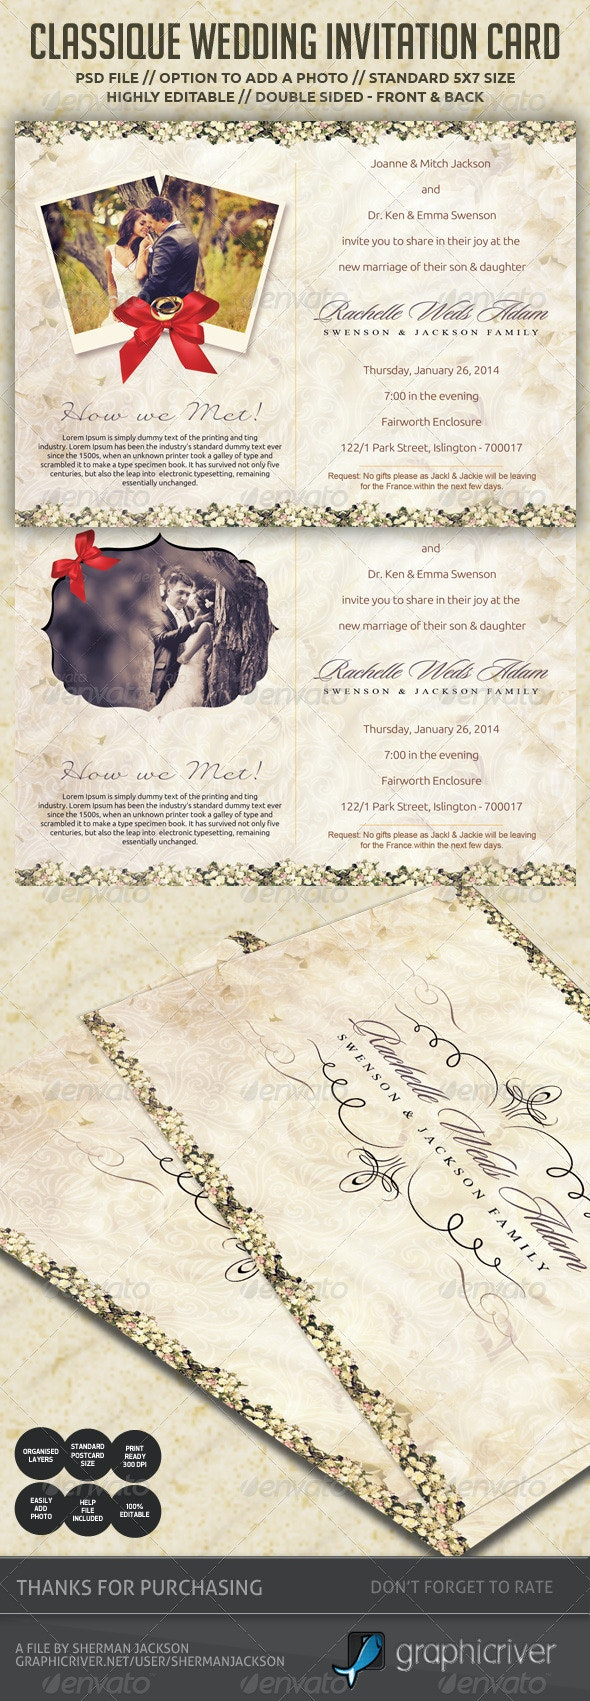 Classique Wedding Invitation / Postcard - Weddings Cards & Invites